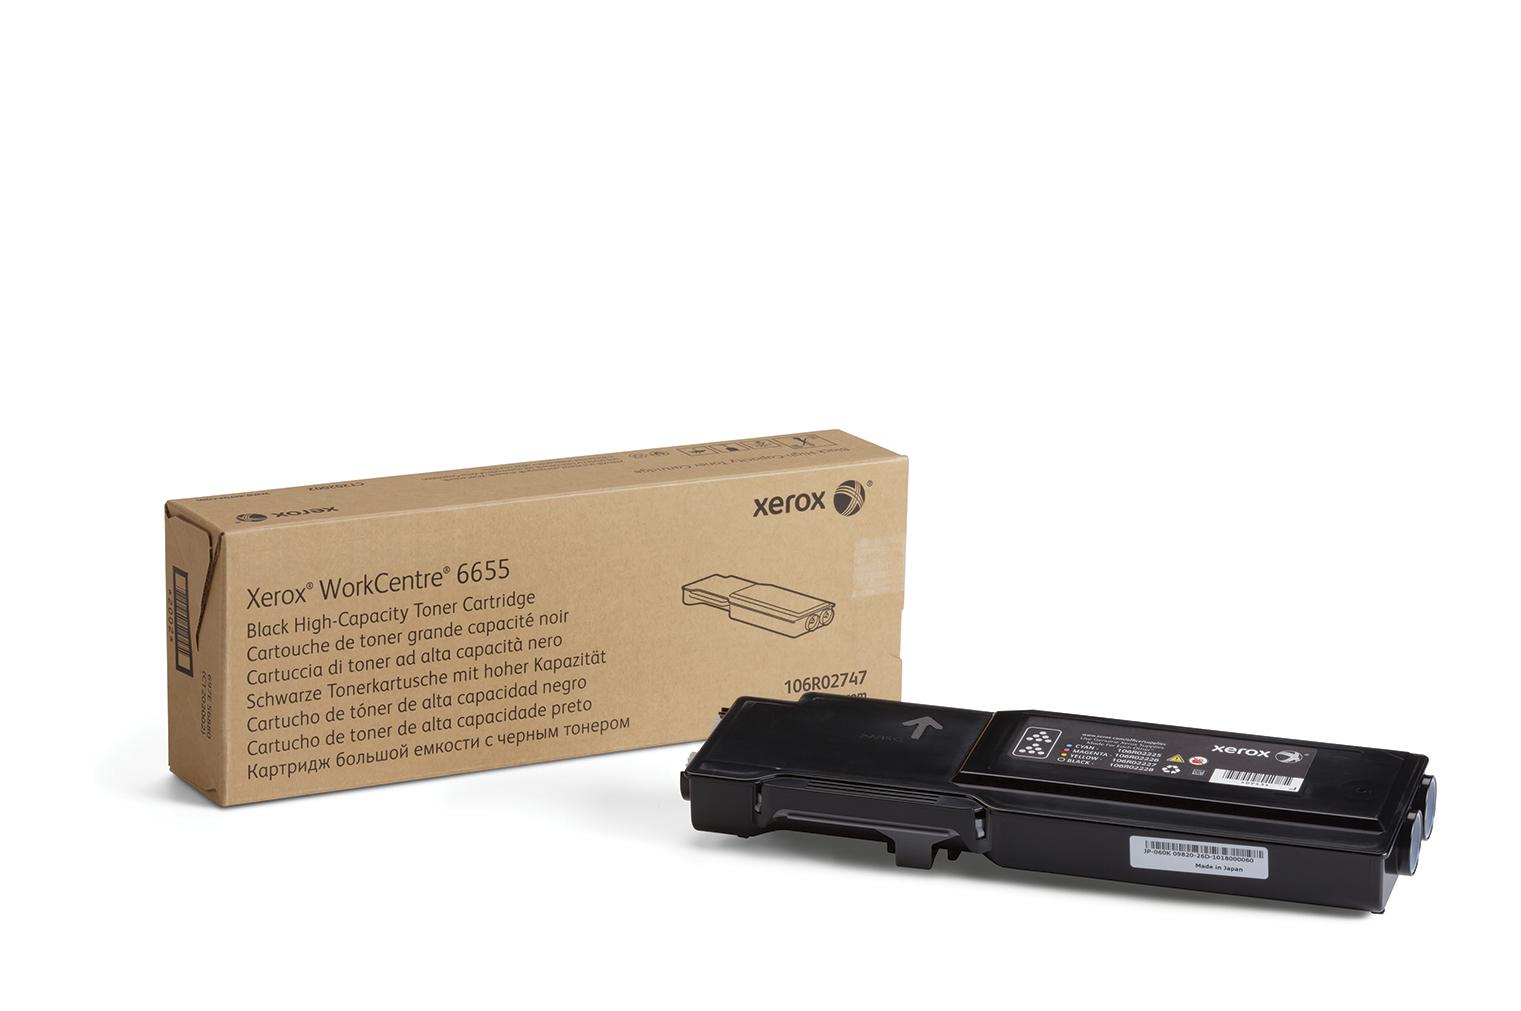 106R02747 | Original Xerox Toner Cartridge - Black